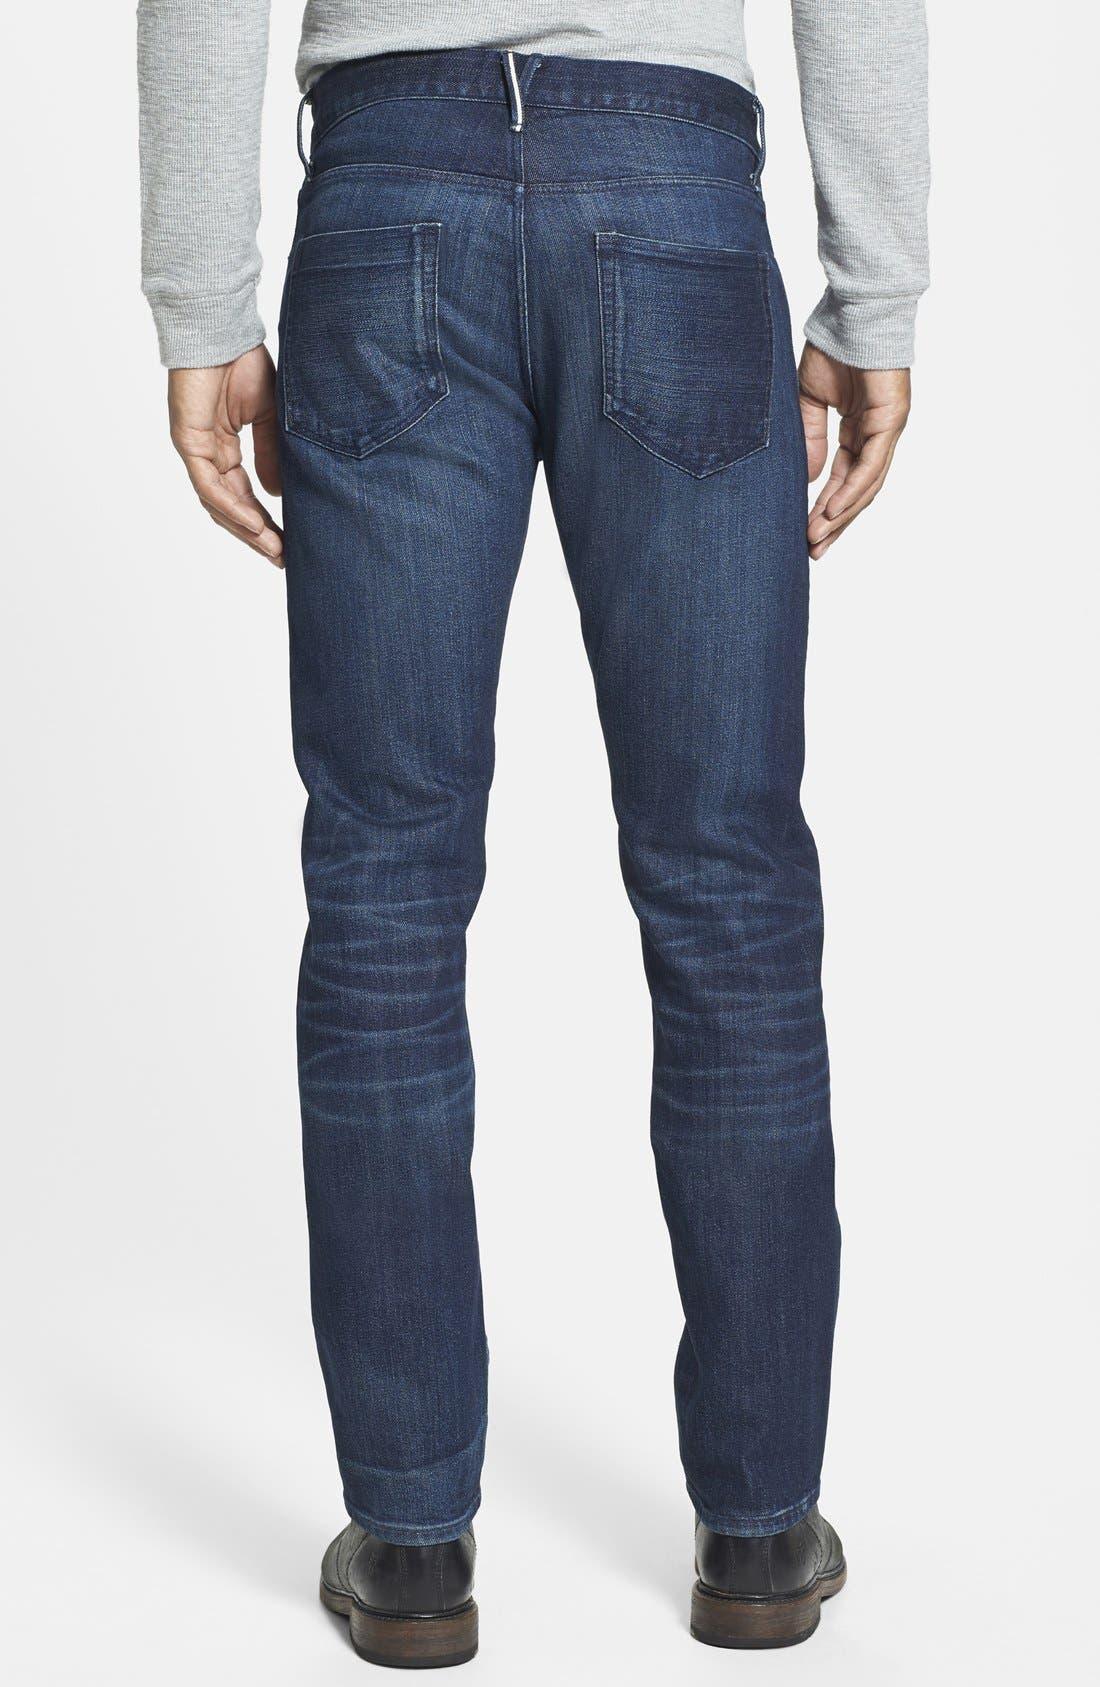 'M3' Slim Fit Selvedge Jeans,                             Alternate thumbnail 2, color,                             413